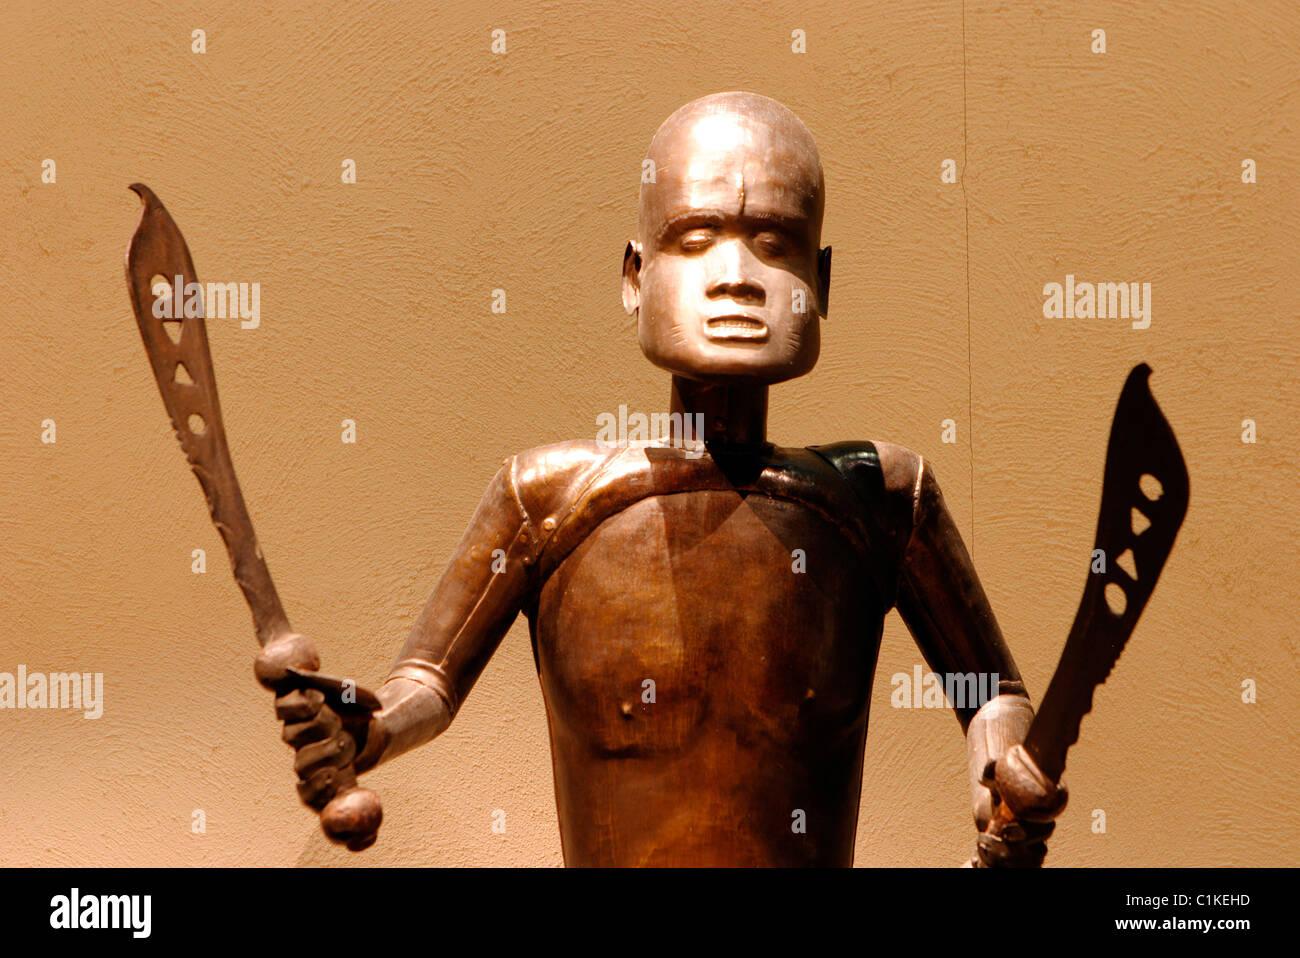 France, Paris, Museum of African arts Dapper - Stock Image